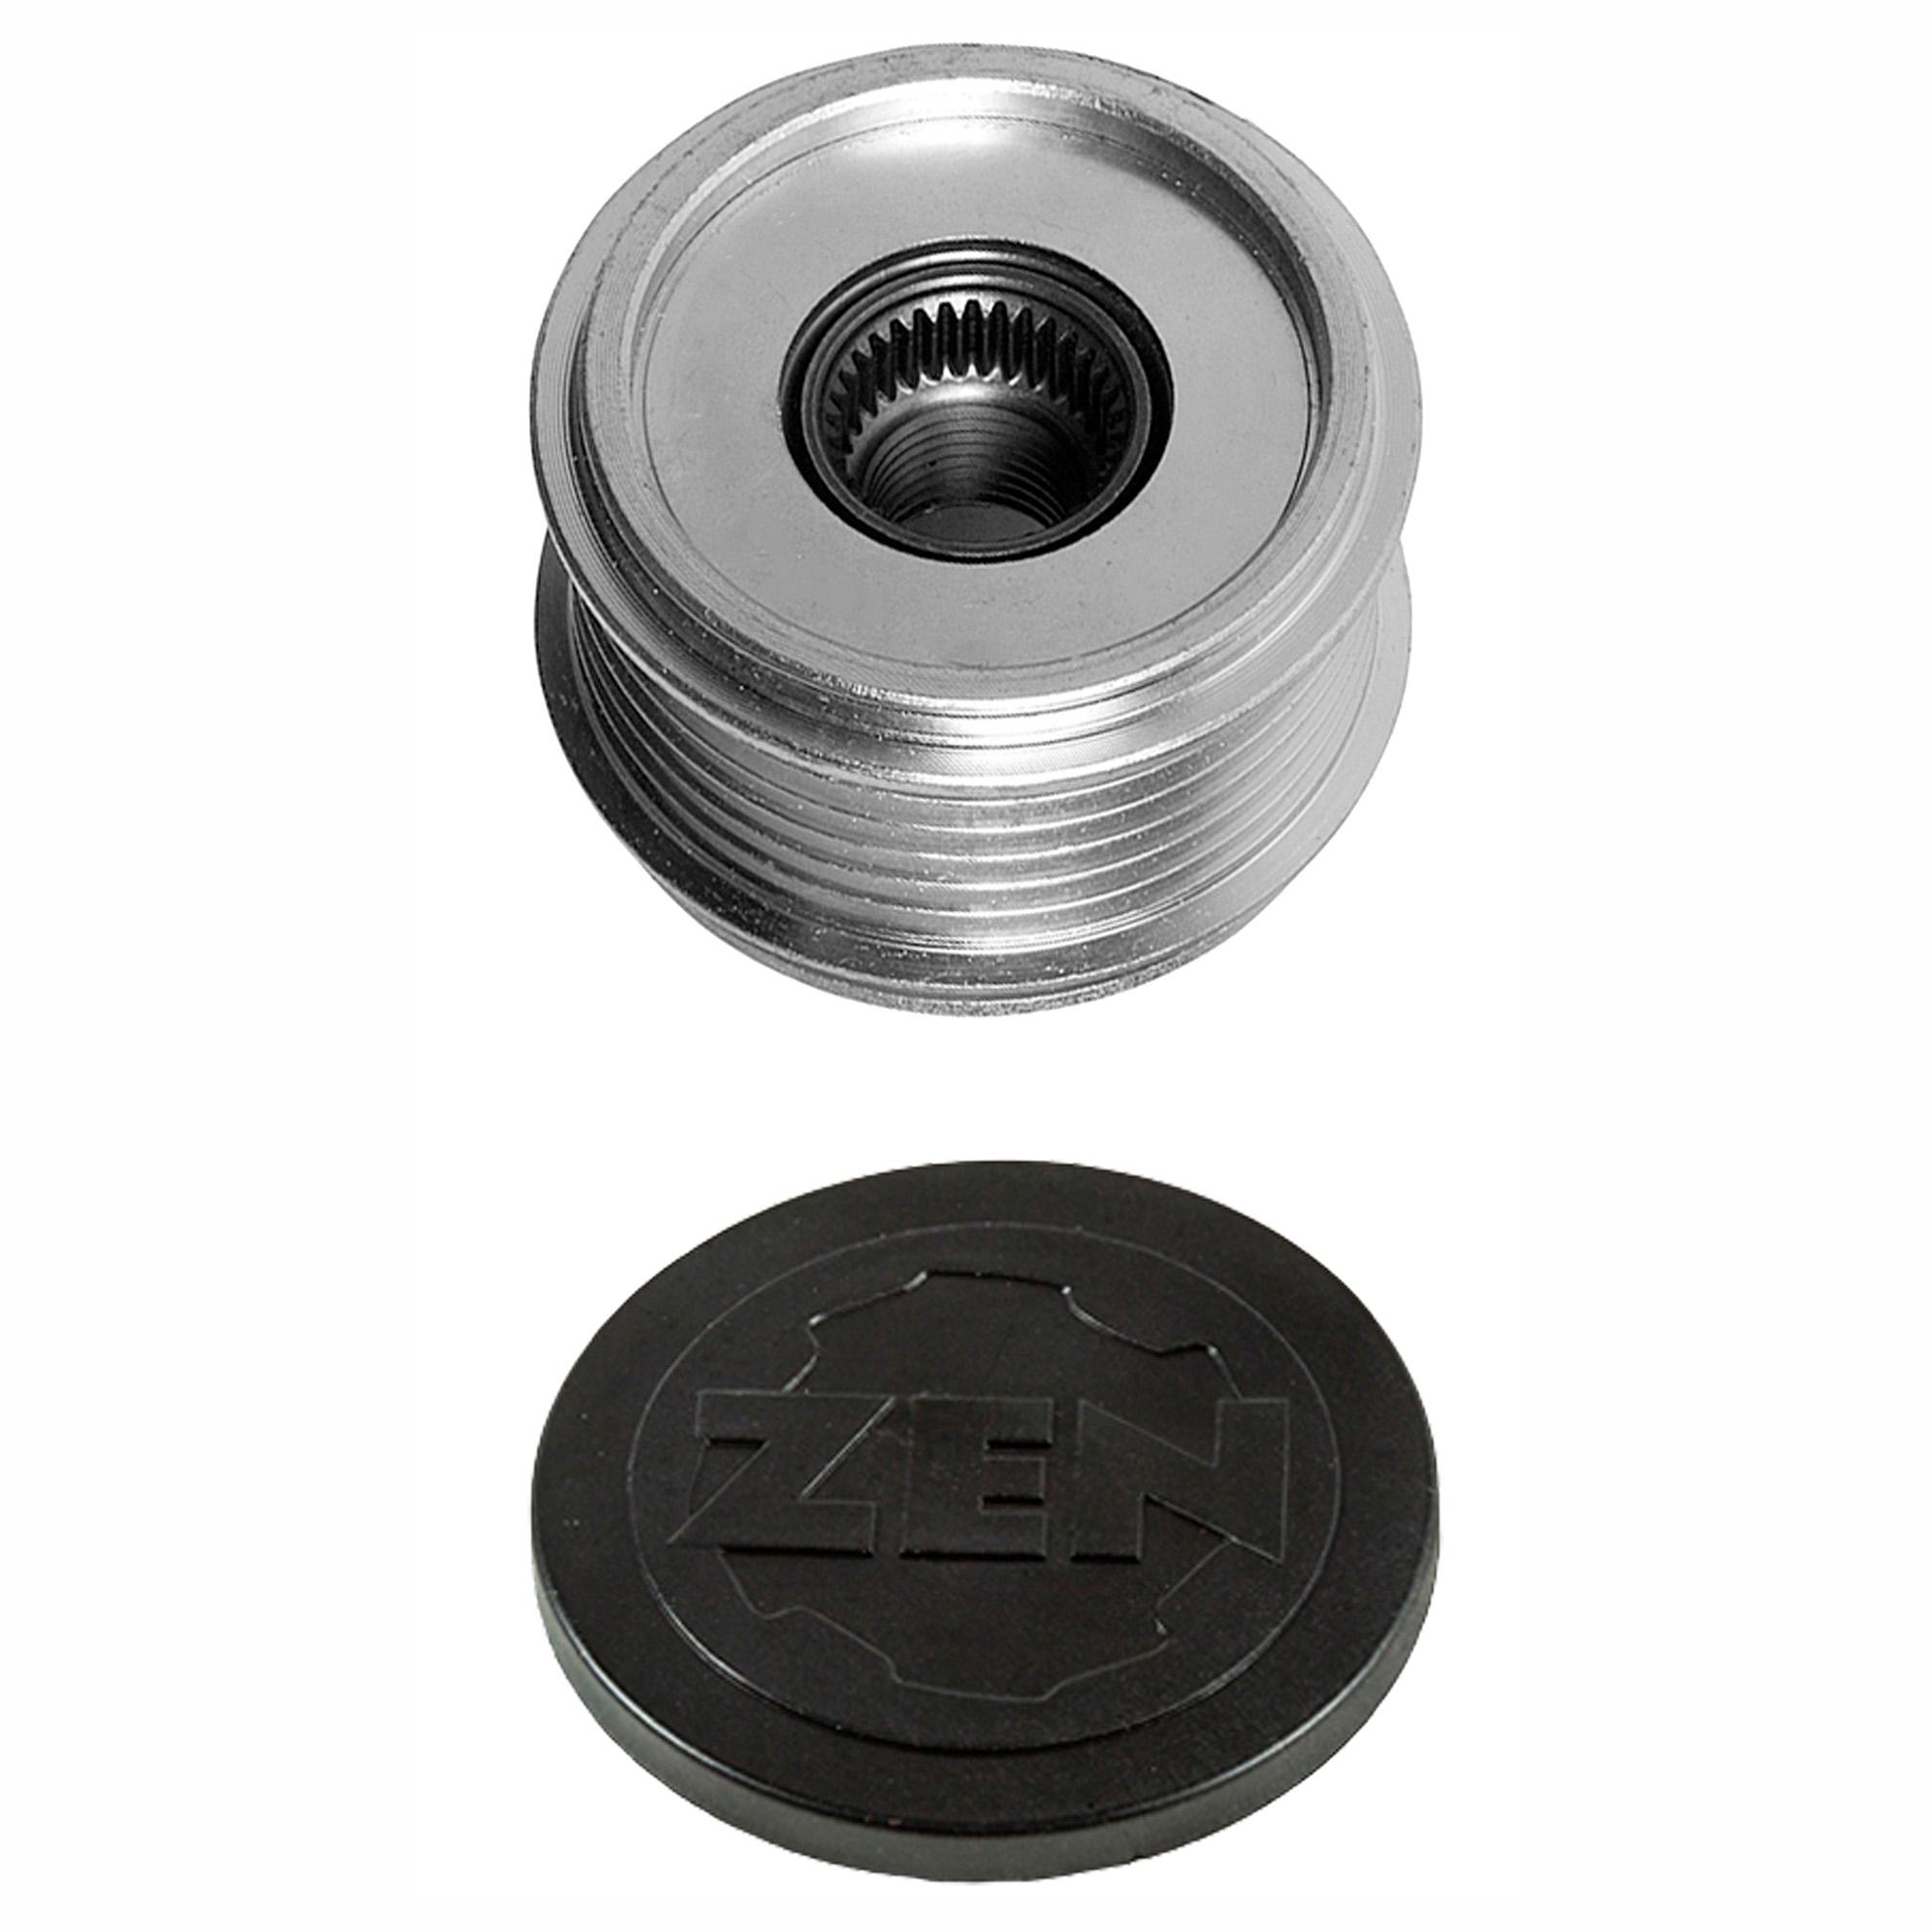 Polia Alternador Roda Livre AUDI A3 A4 A6 TT (ZEN5448)